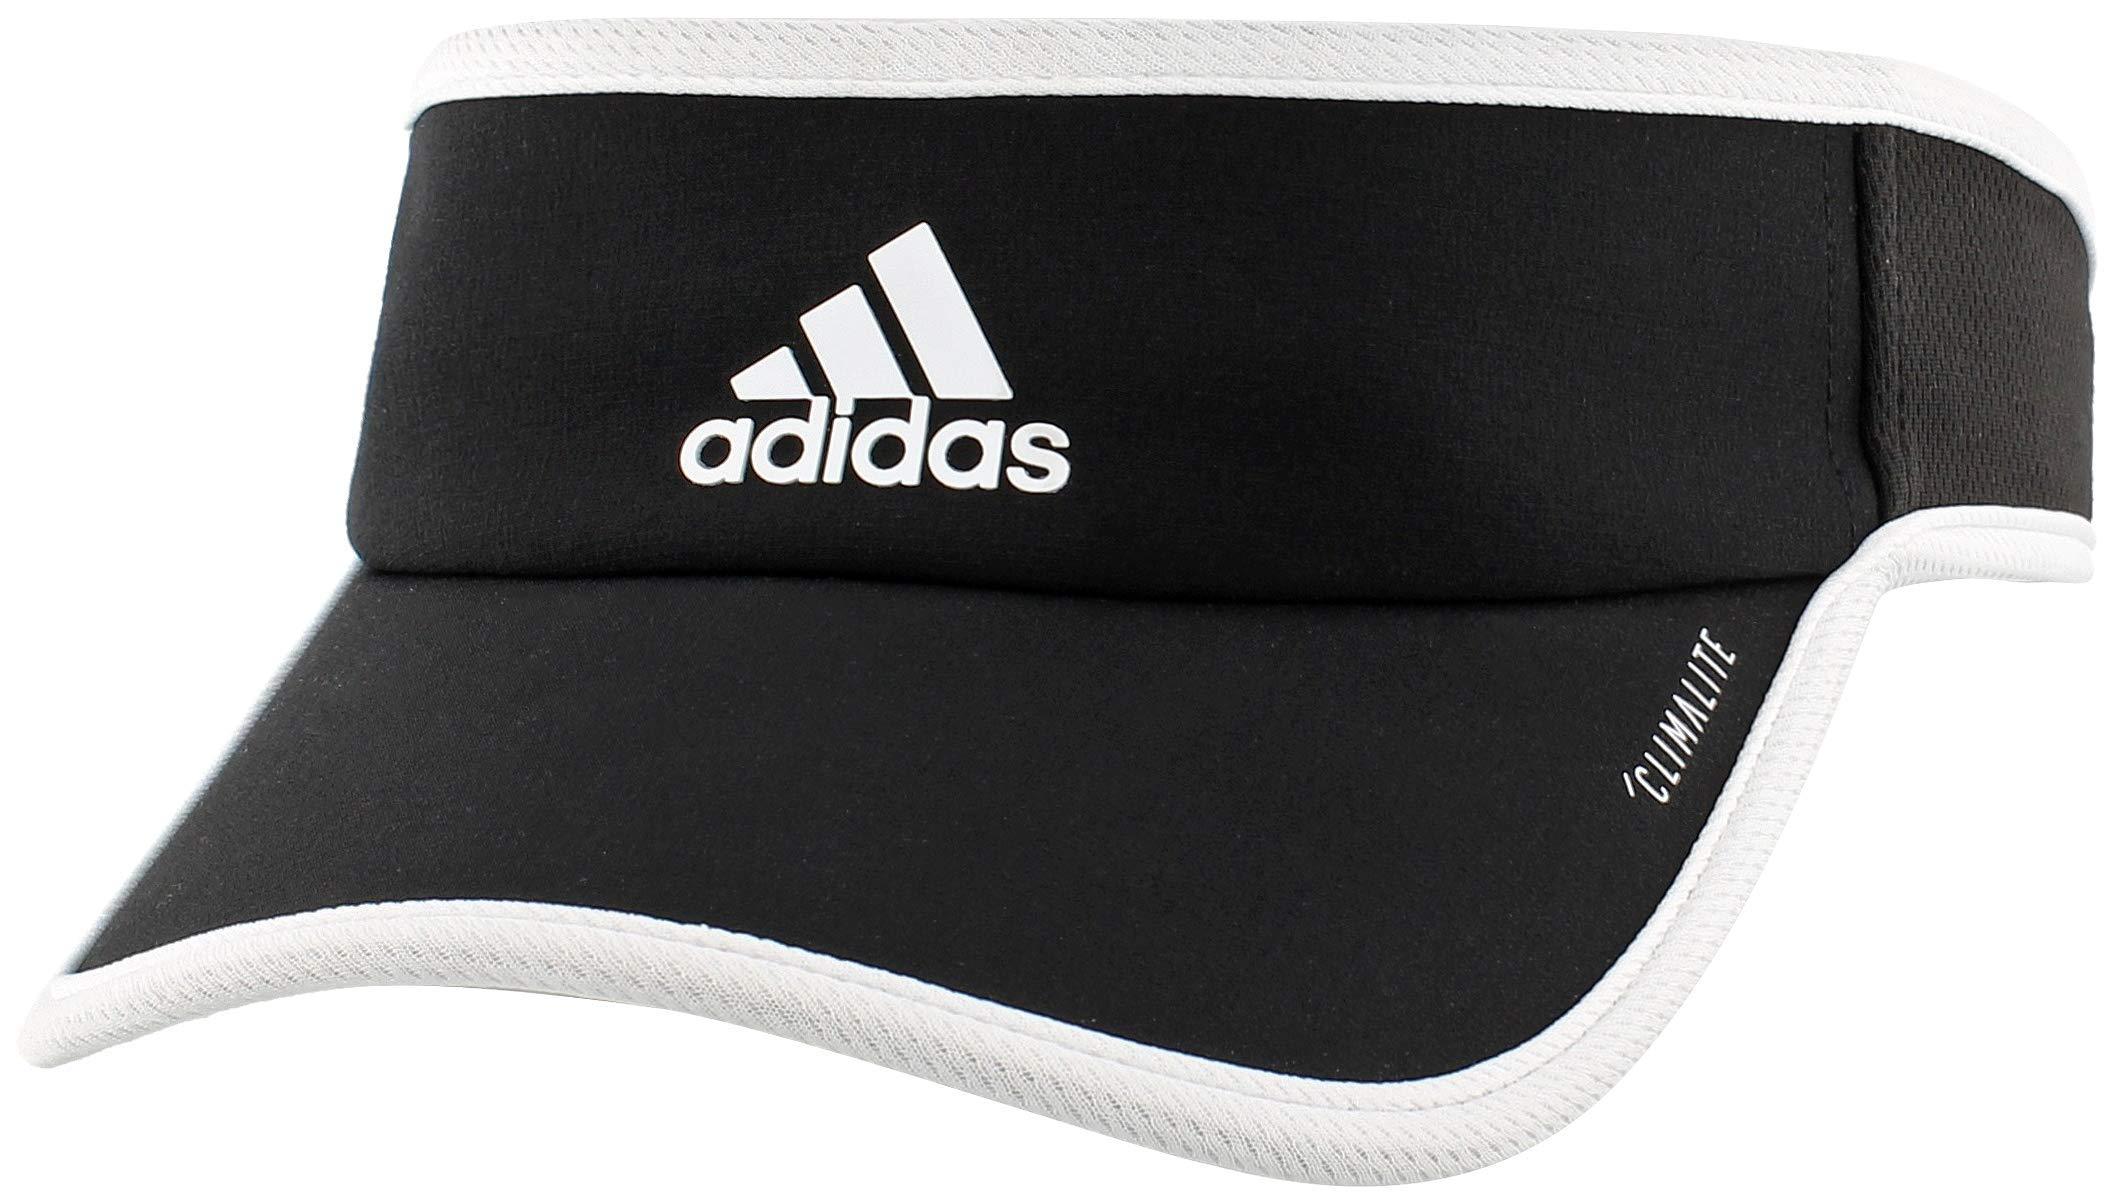 adidas Womens Adjustable Sports Performance Superlite Visor